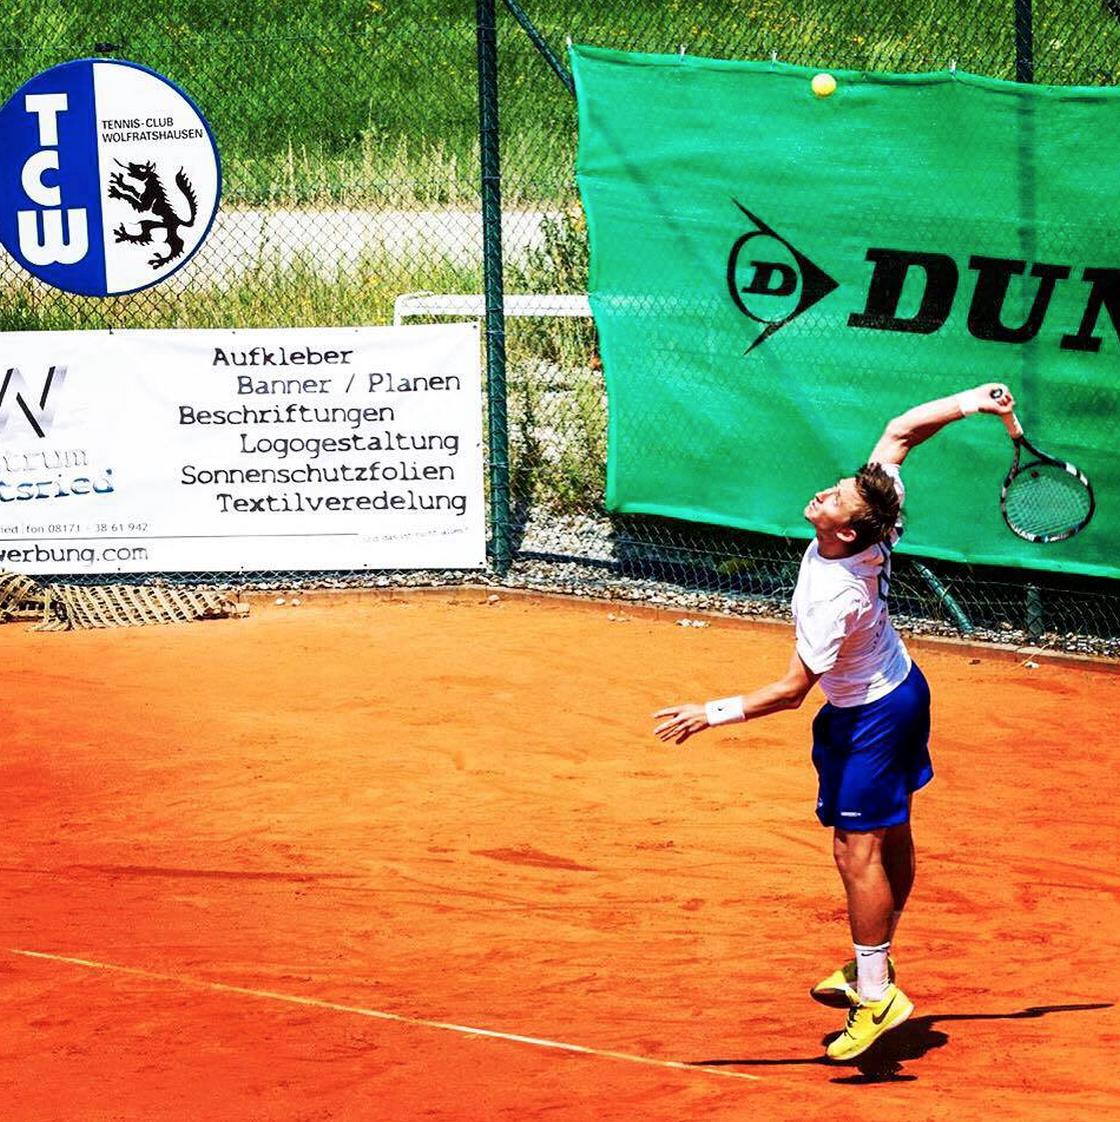 Jacob S. teaches tennis lessons in St. Petersburg, FL